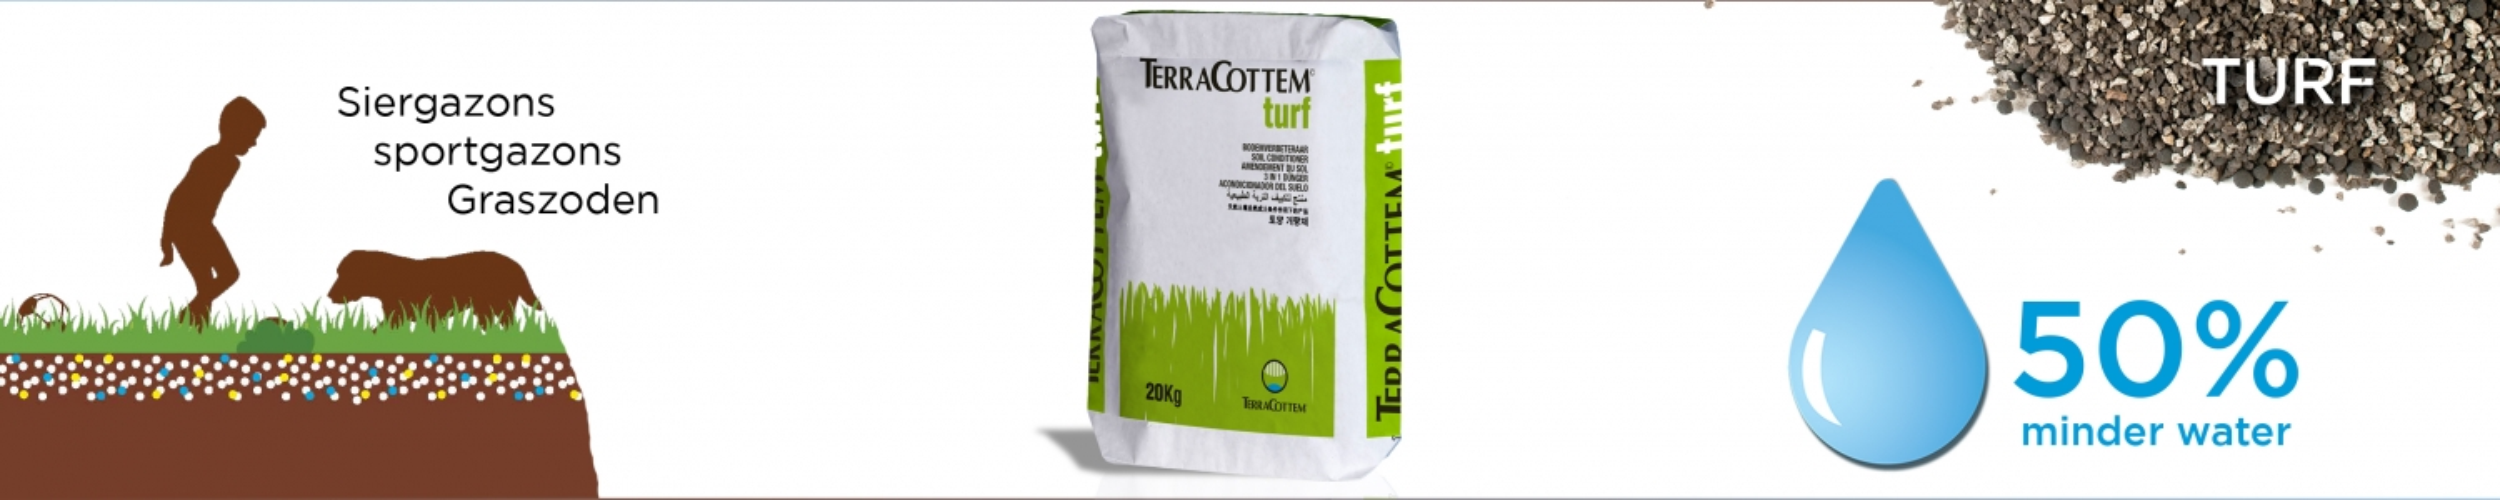 TerraCottem Turf - 20kg